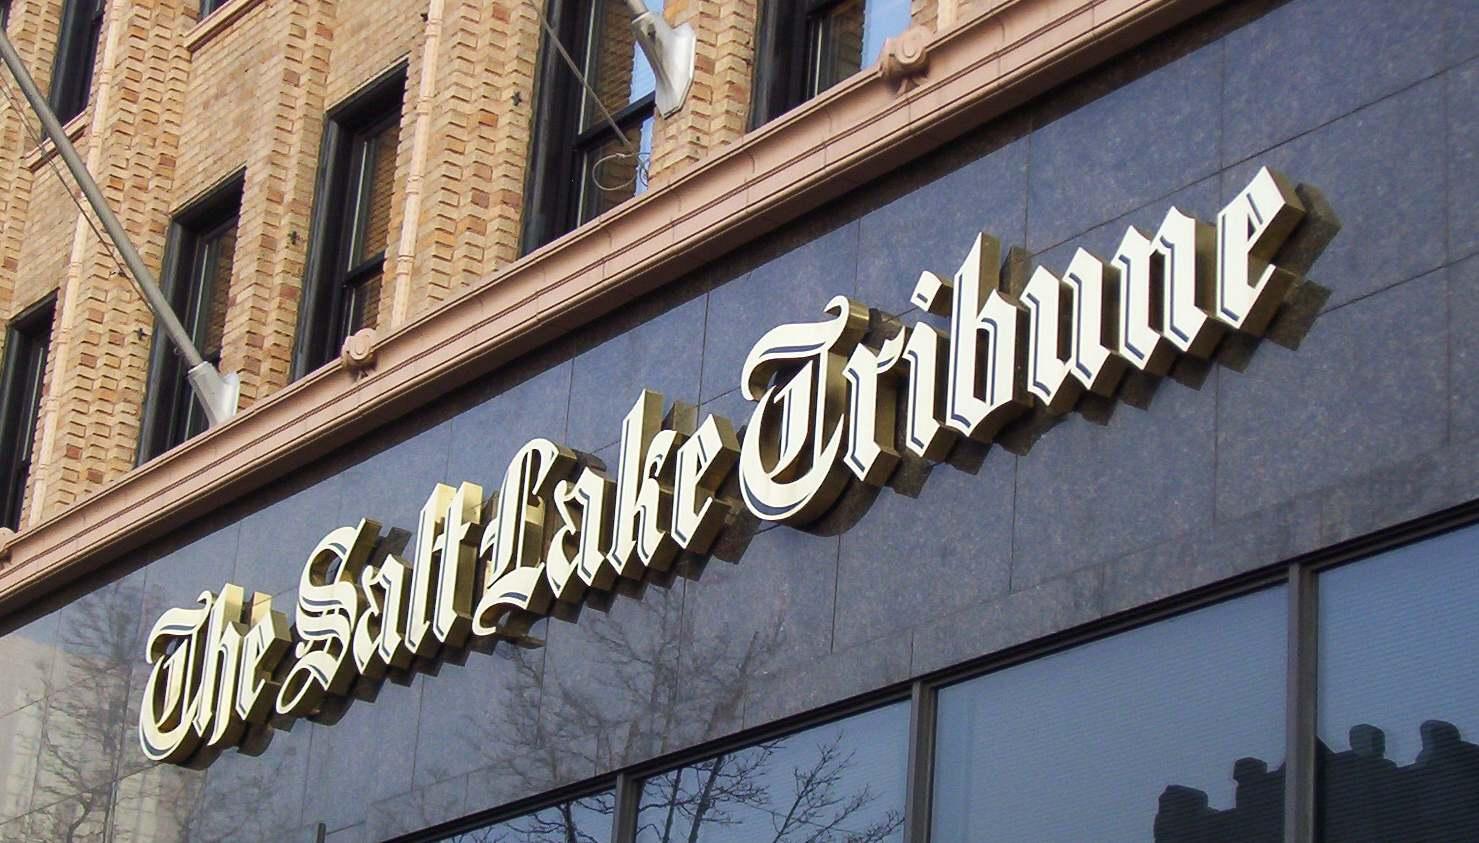 The Salt Lake Tribune marquee on the Ezra Thompson Building.